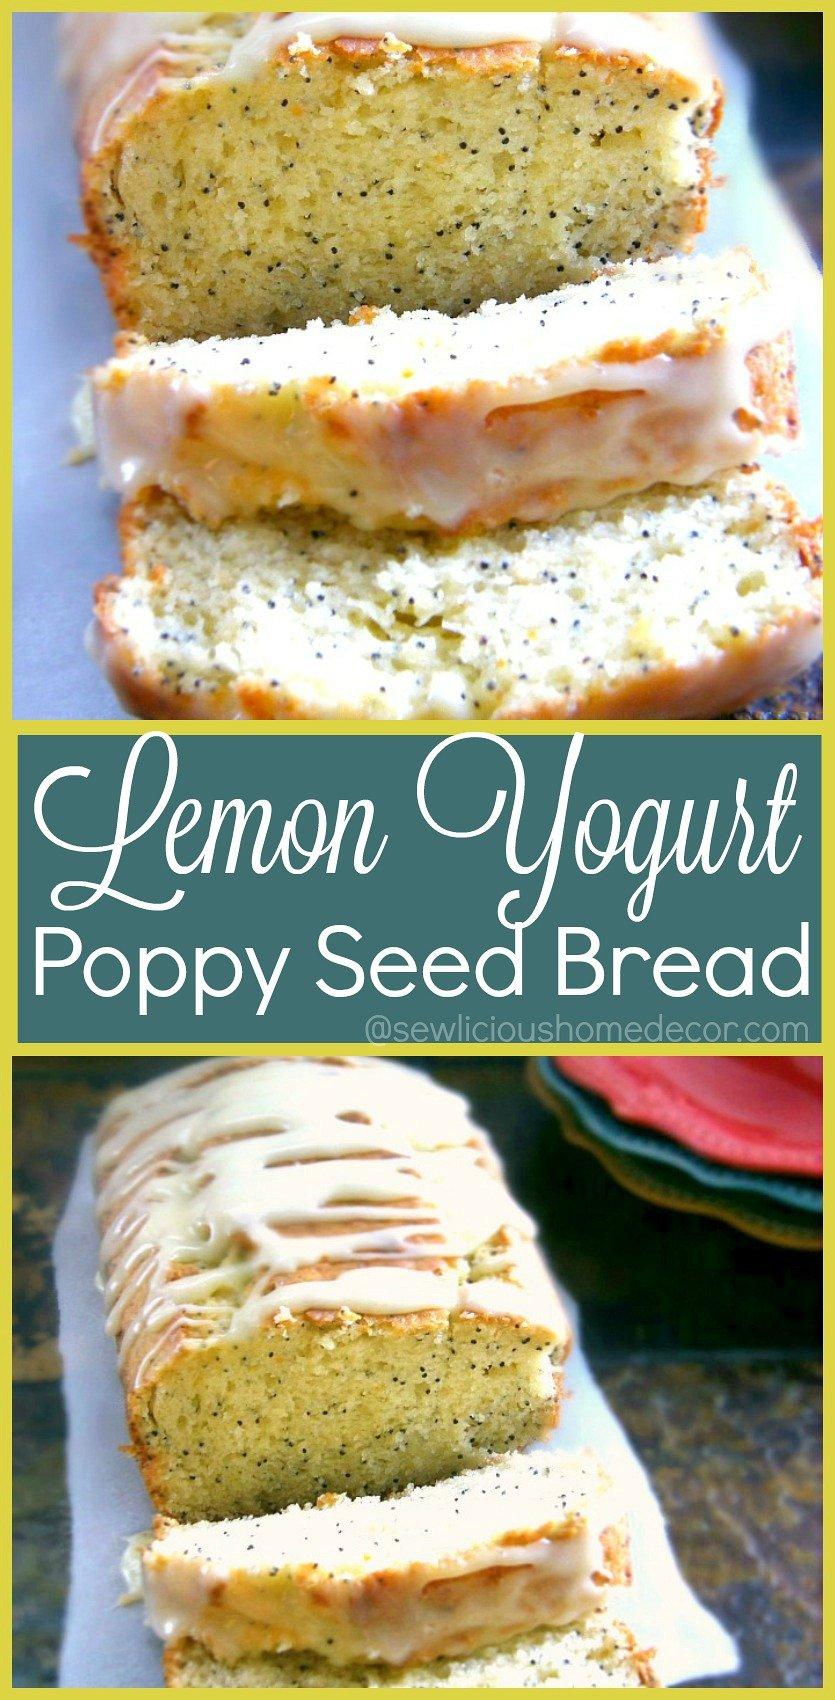 Light and Moist Lemon Greek Yogurt Poppy Seed Bread sewlicioushomedecor.com